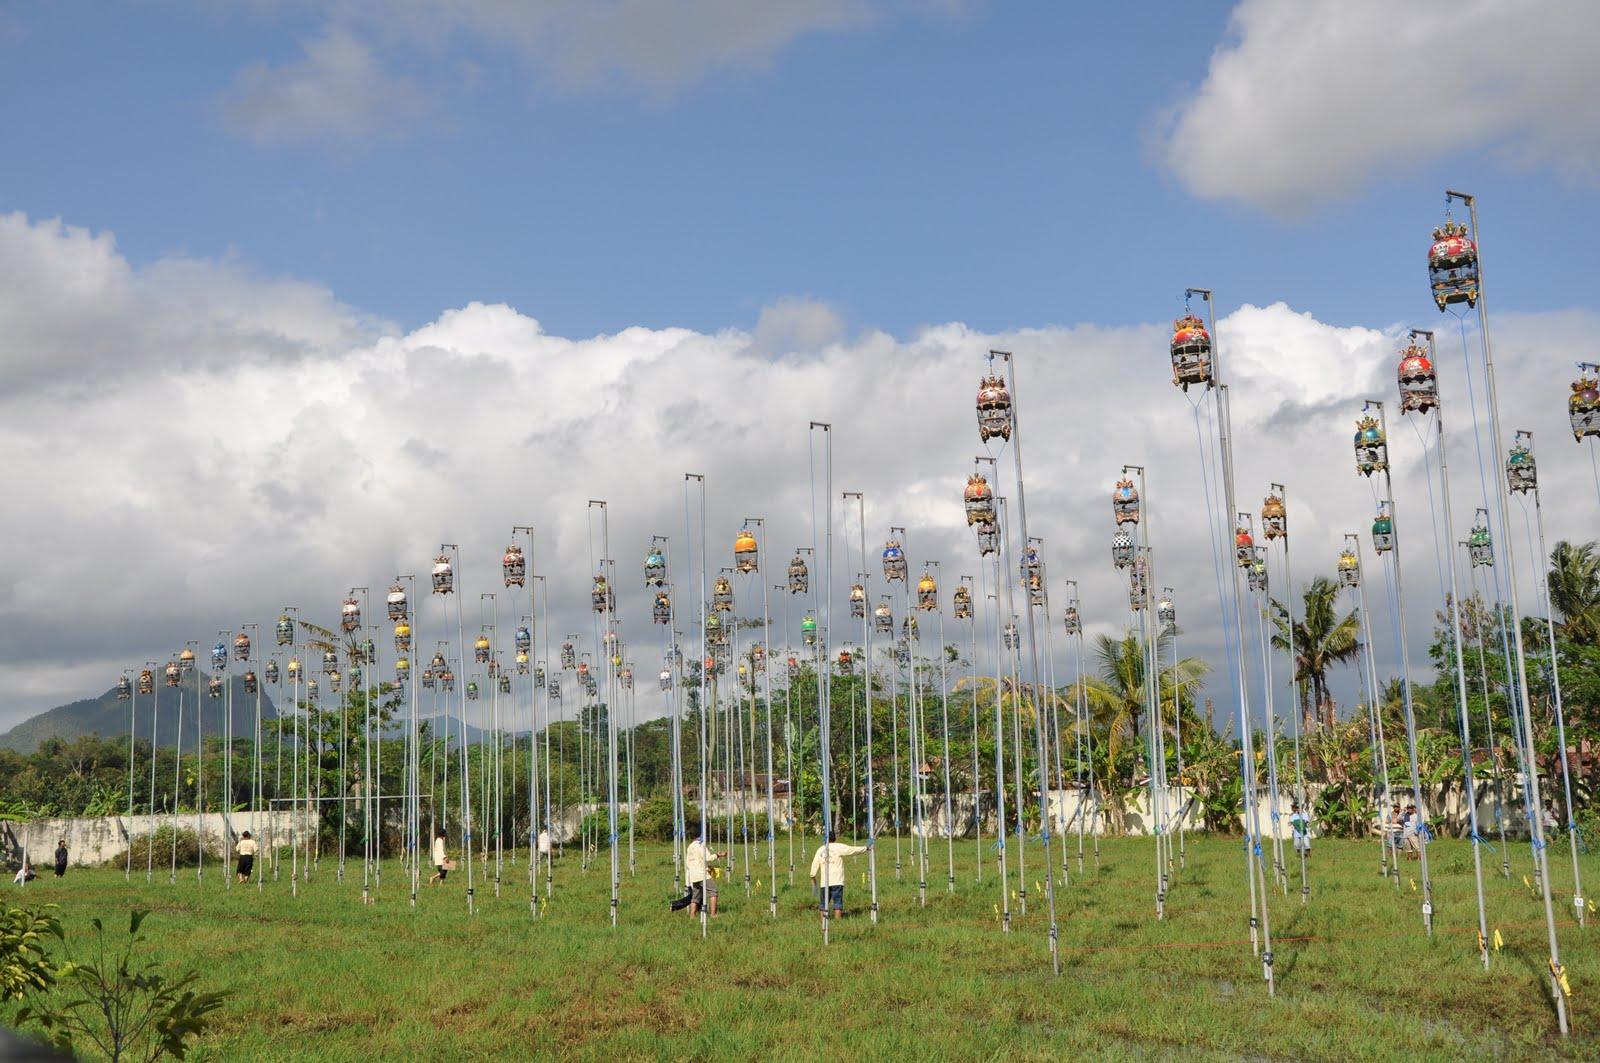 Institut ilmu pendidikan dinamika sistem katrol contoh pemanfaatan katrol tetap pada event lomba kicau burung sumber gambar humas trenggalek2spot ccuart Choice Image